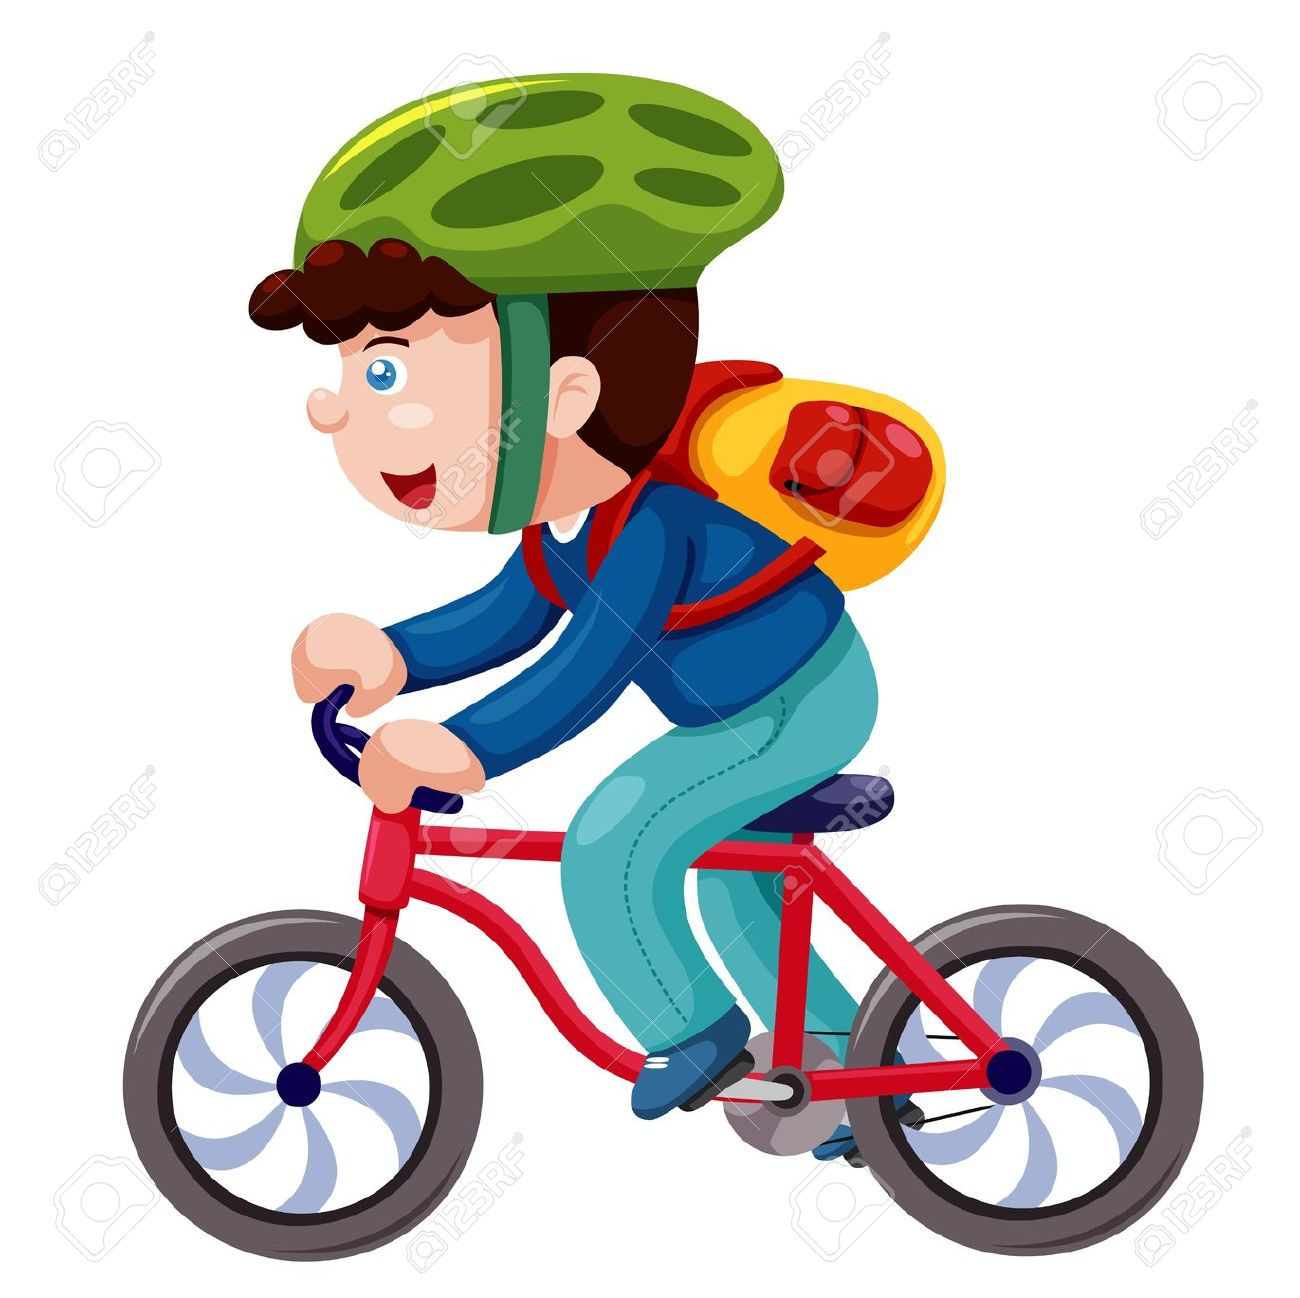 Kind auf fahrrad clipart vector freeuse stock Kind auf fahrrad clipart - ClipartFest vector freeuse stock